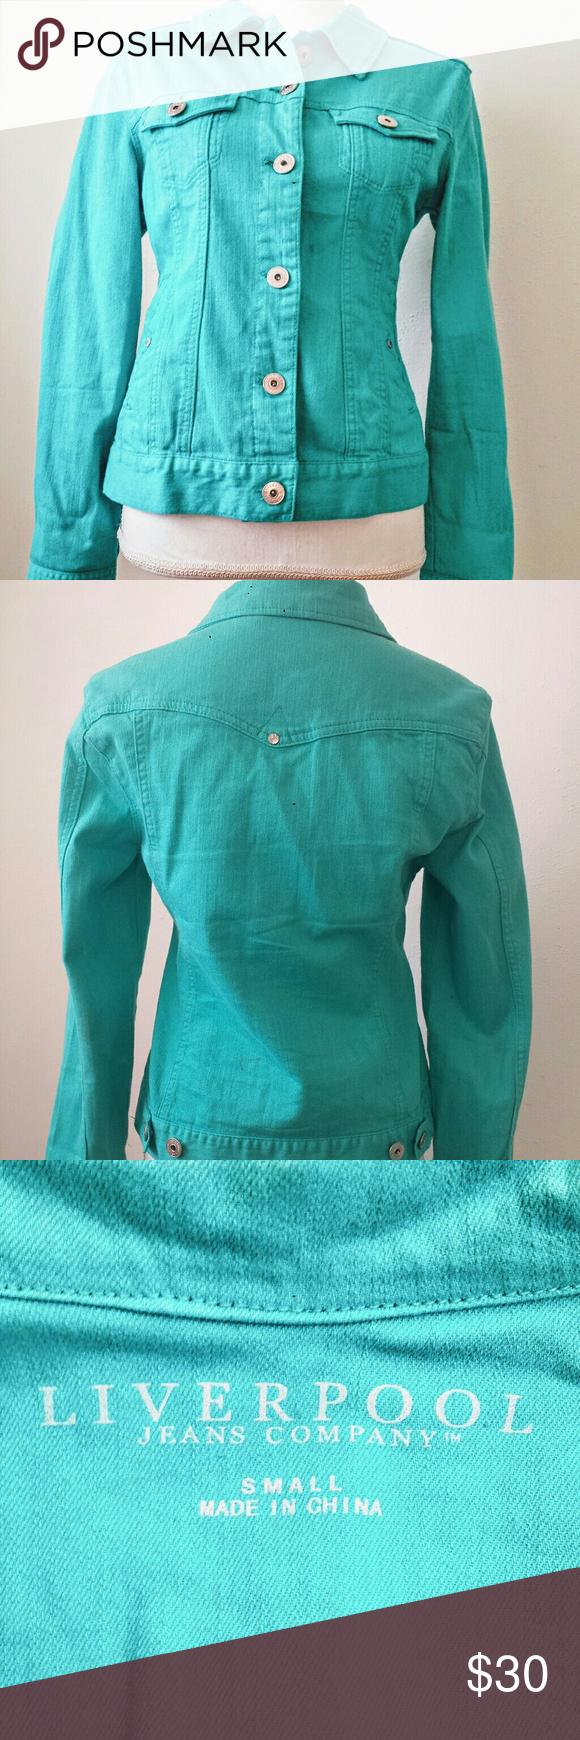 Liverpool Jean Jacket Liverpool Jeans Clothes Design Jean Jacket [ 1740 x 580 Pixel ]